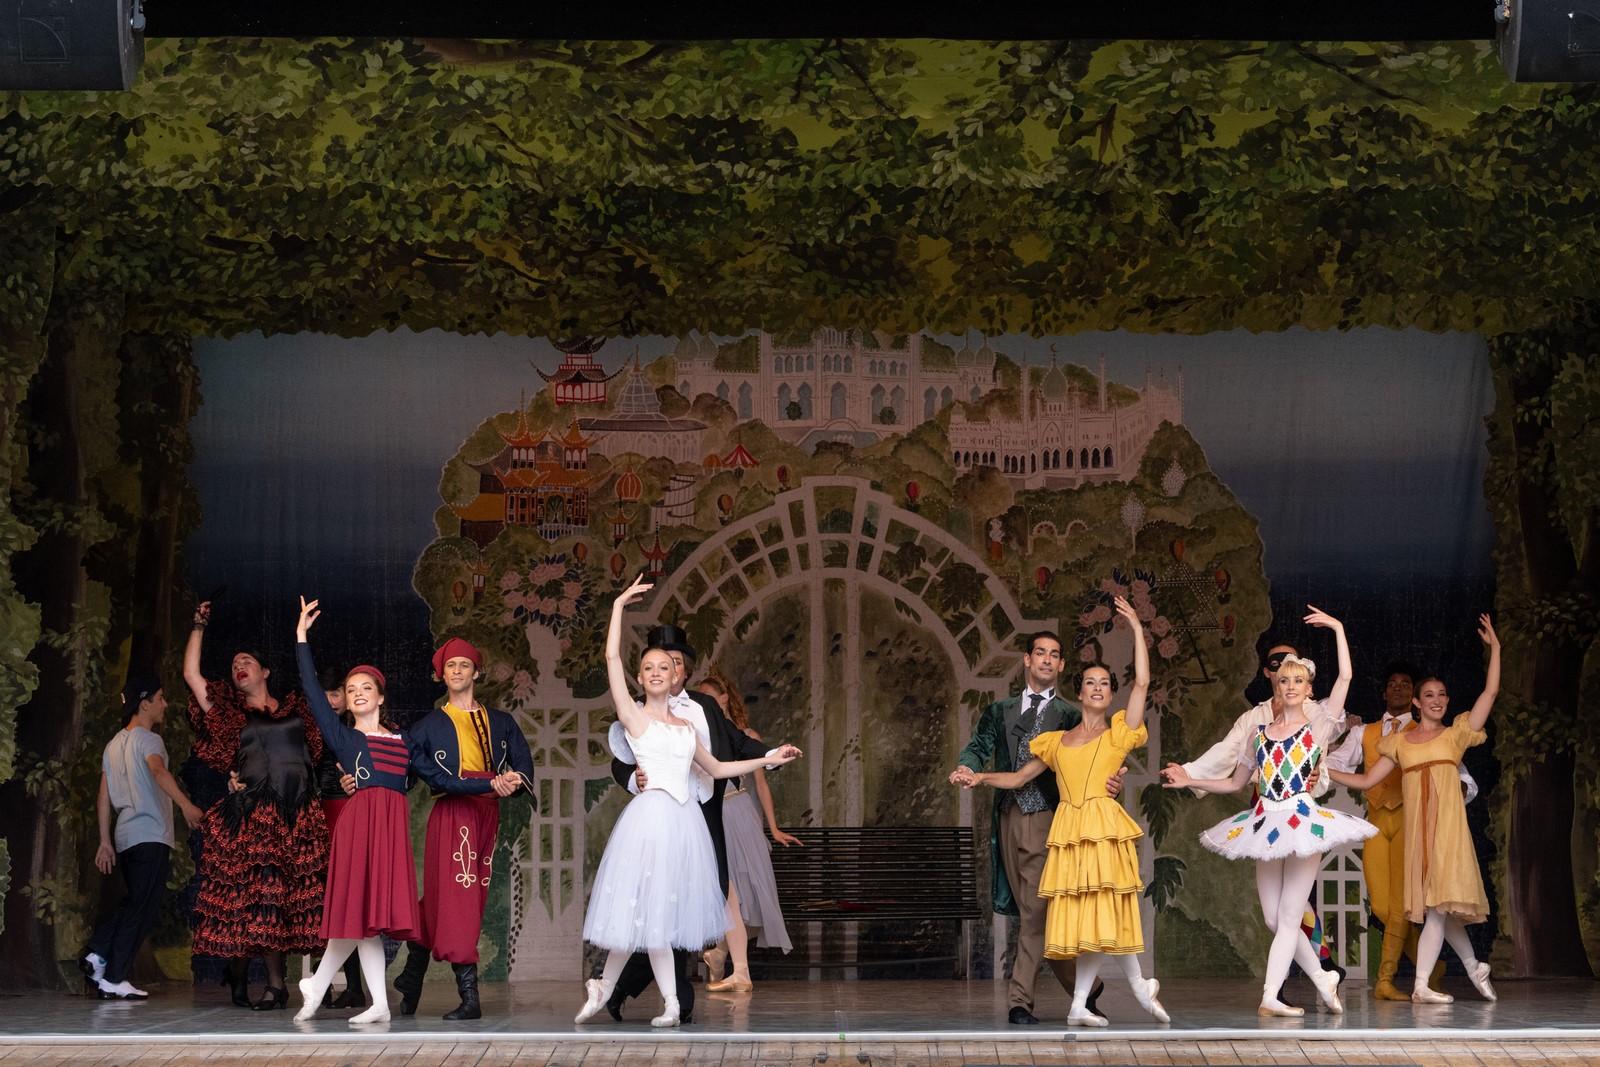 Anmeldelse: Tivolidrømme, Pantomimeteatret, Tivoli (Tivoli Ballet Teater)